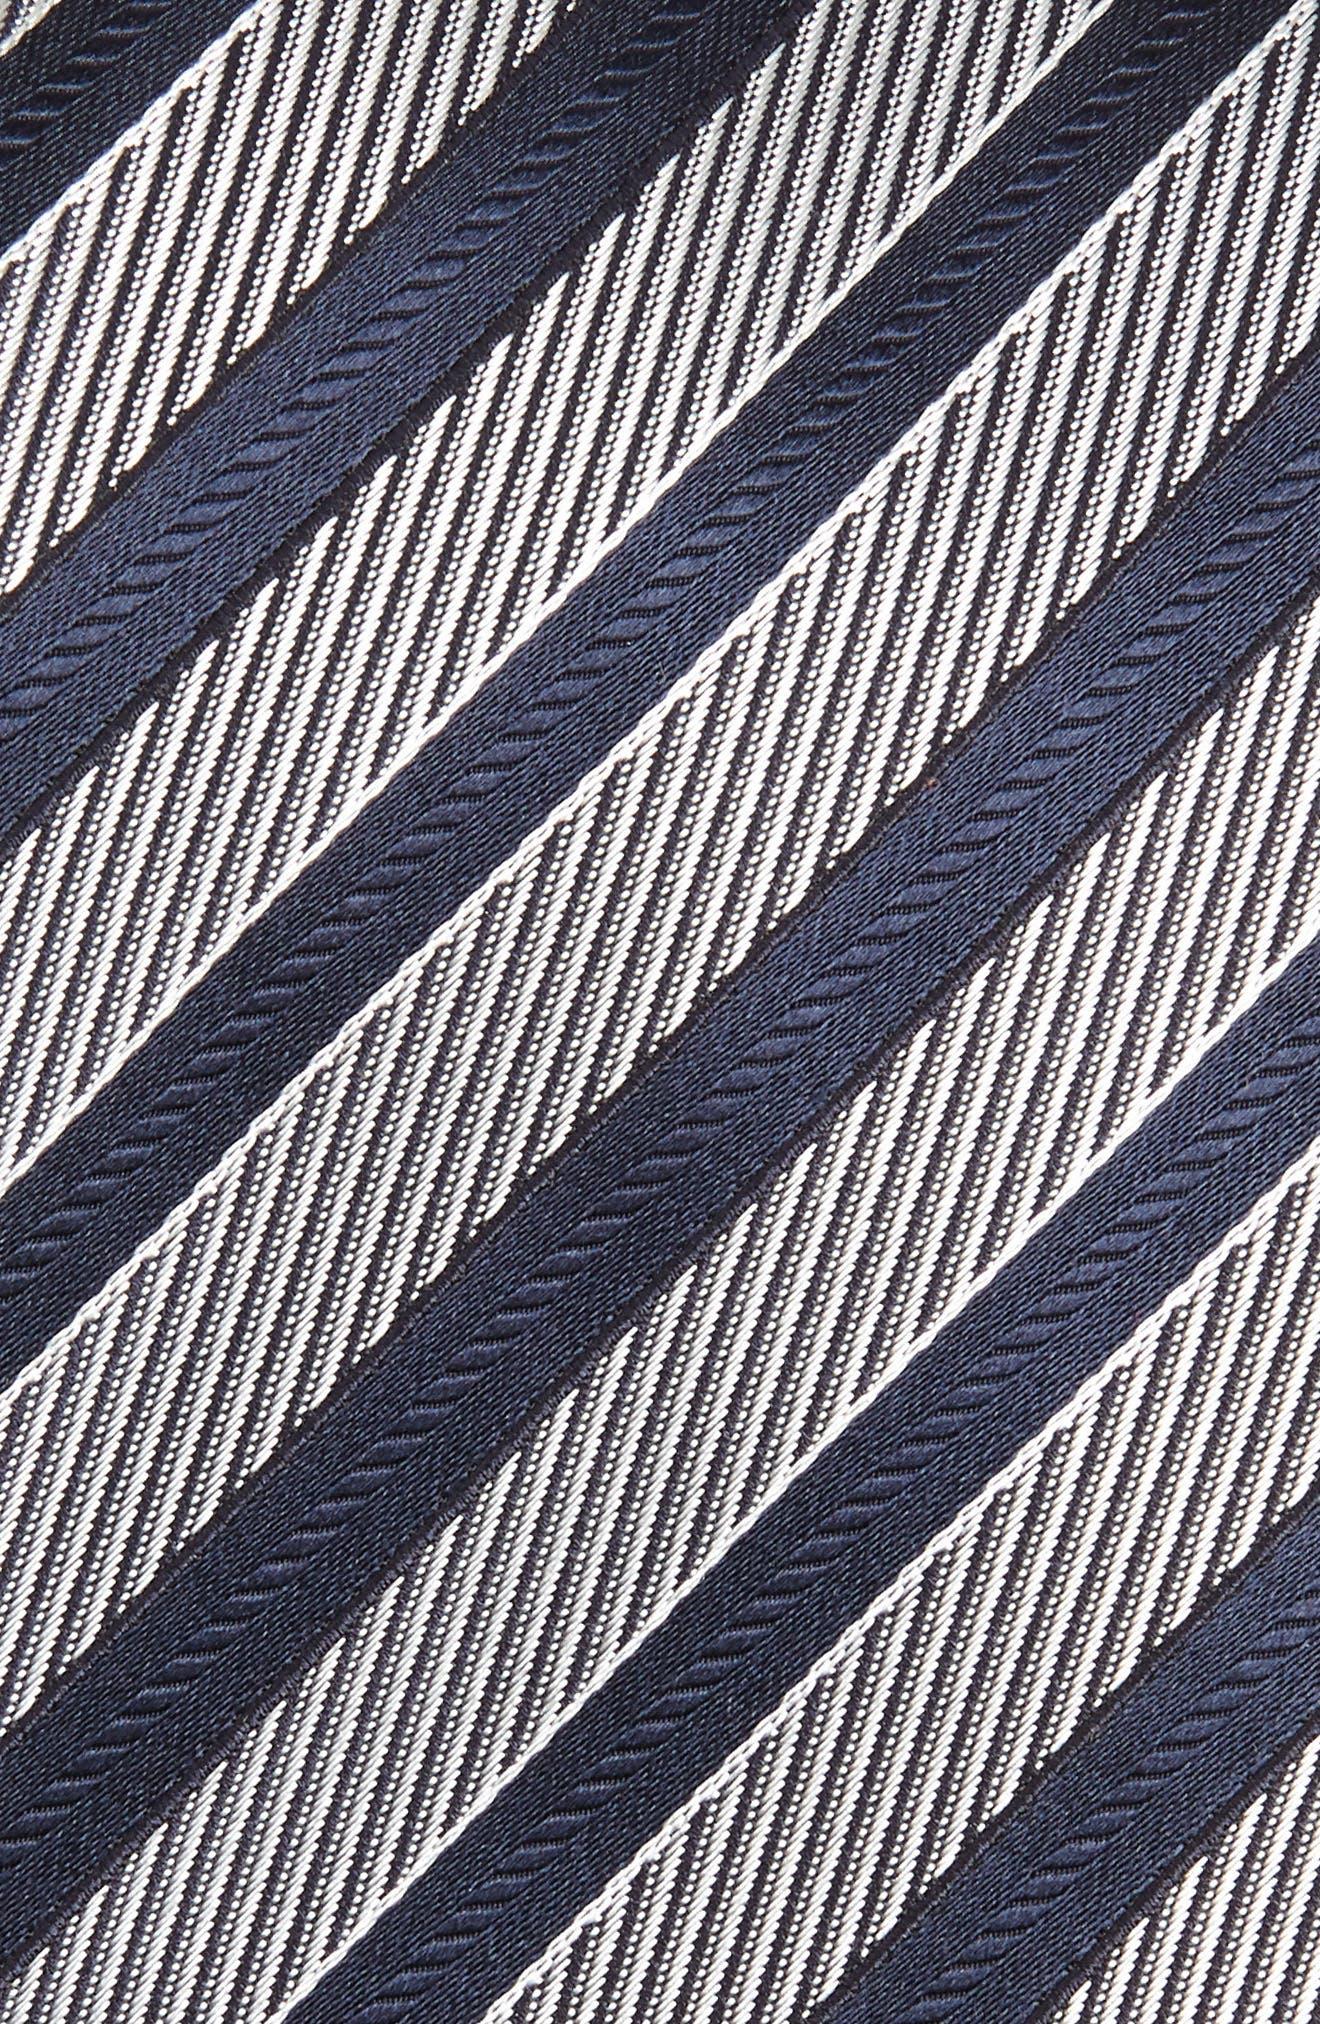 ERMENEGILDO ZEGNA, Stripe Silk Tie, Alternate thumbnail 2, color, NAVY/ SILVER